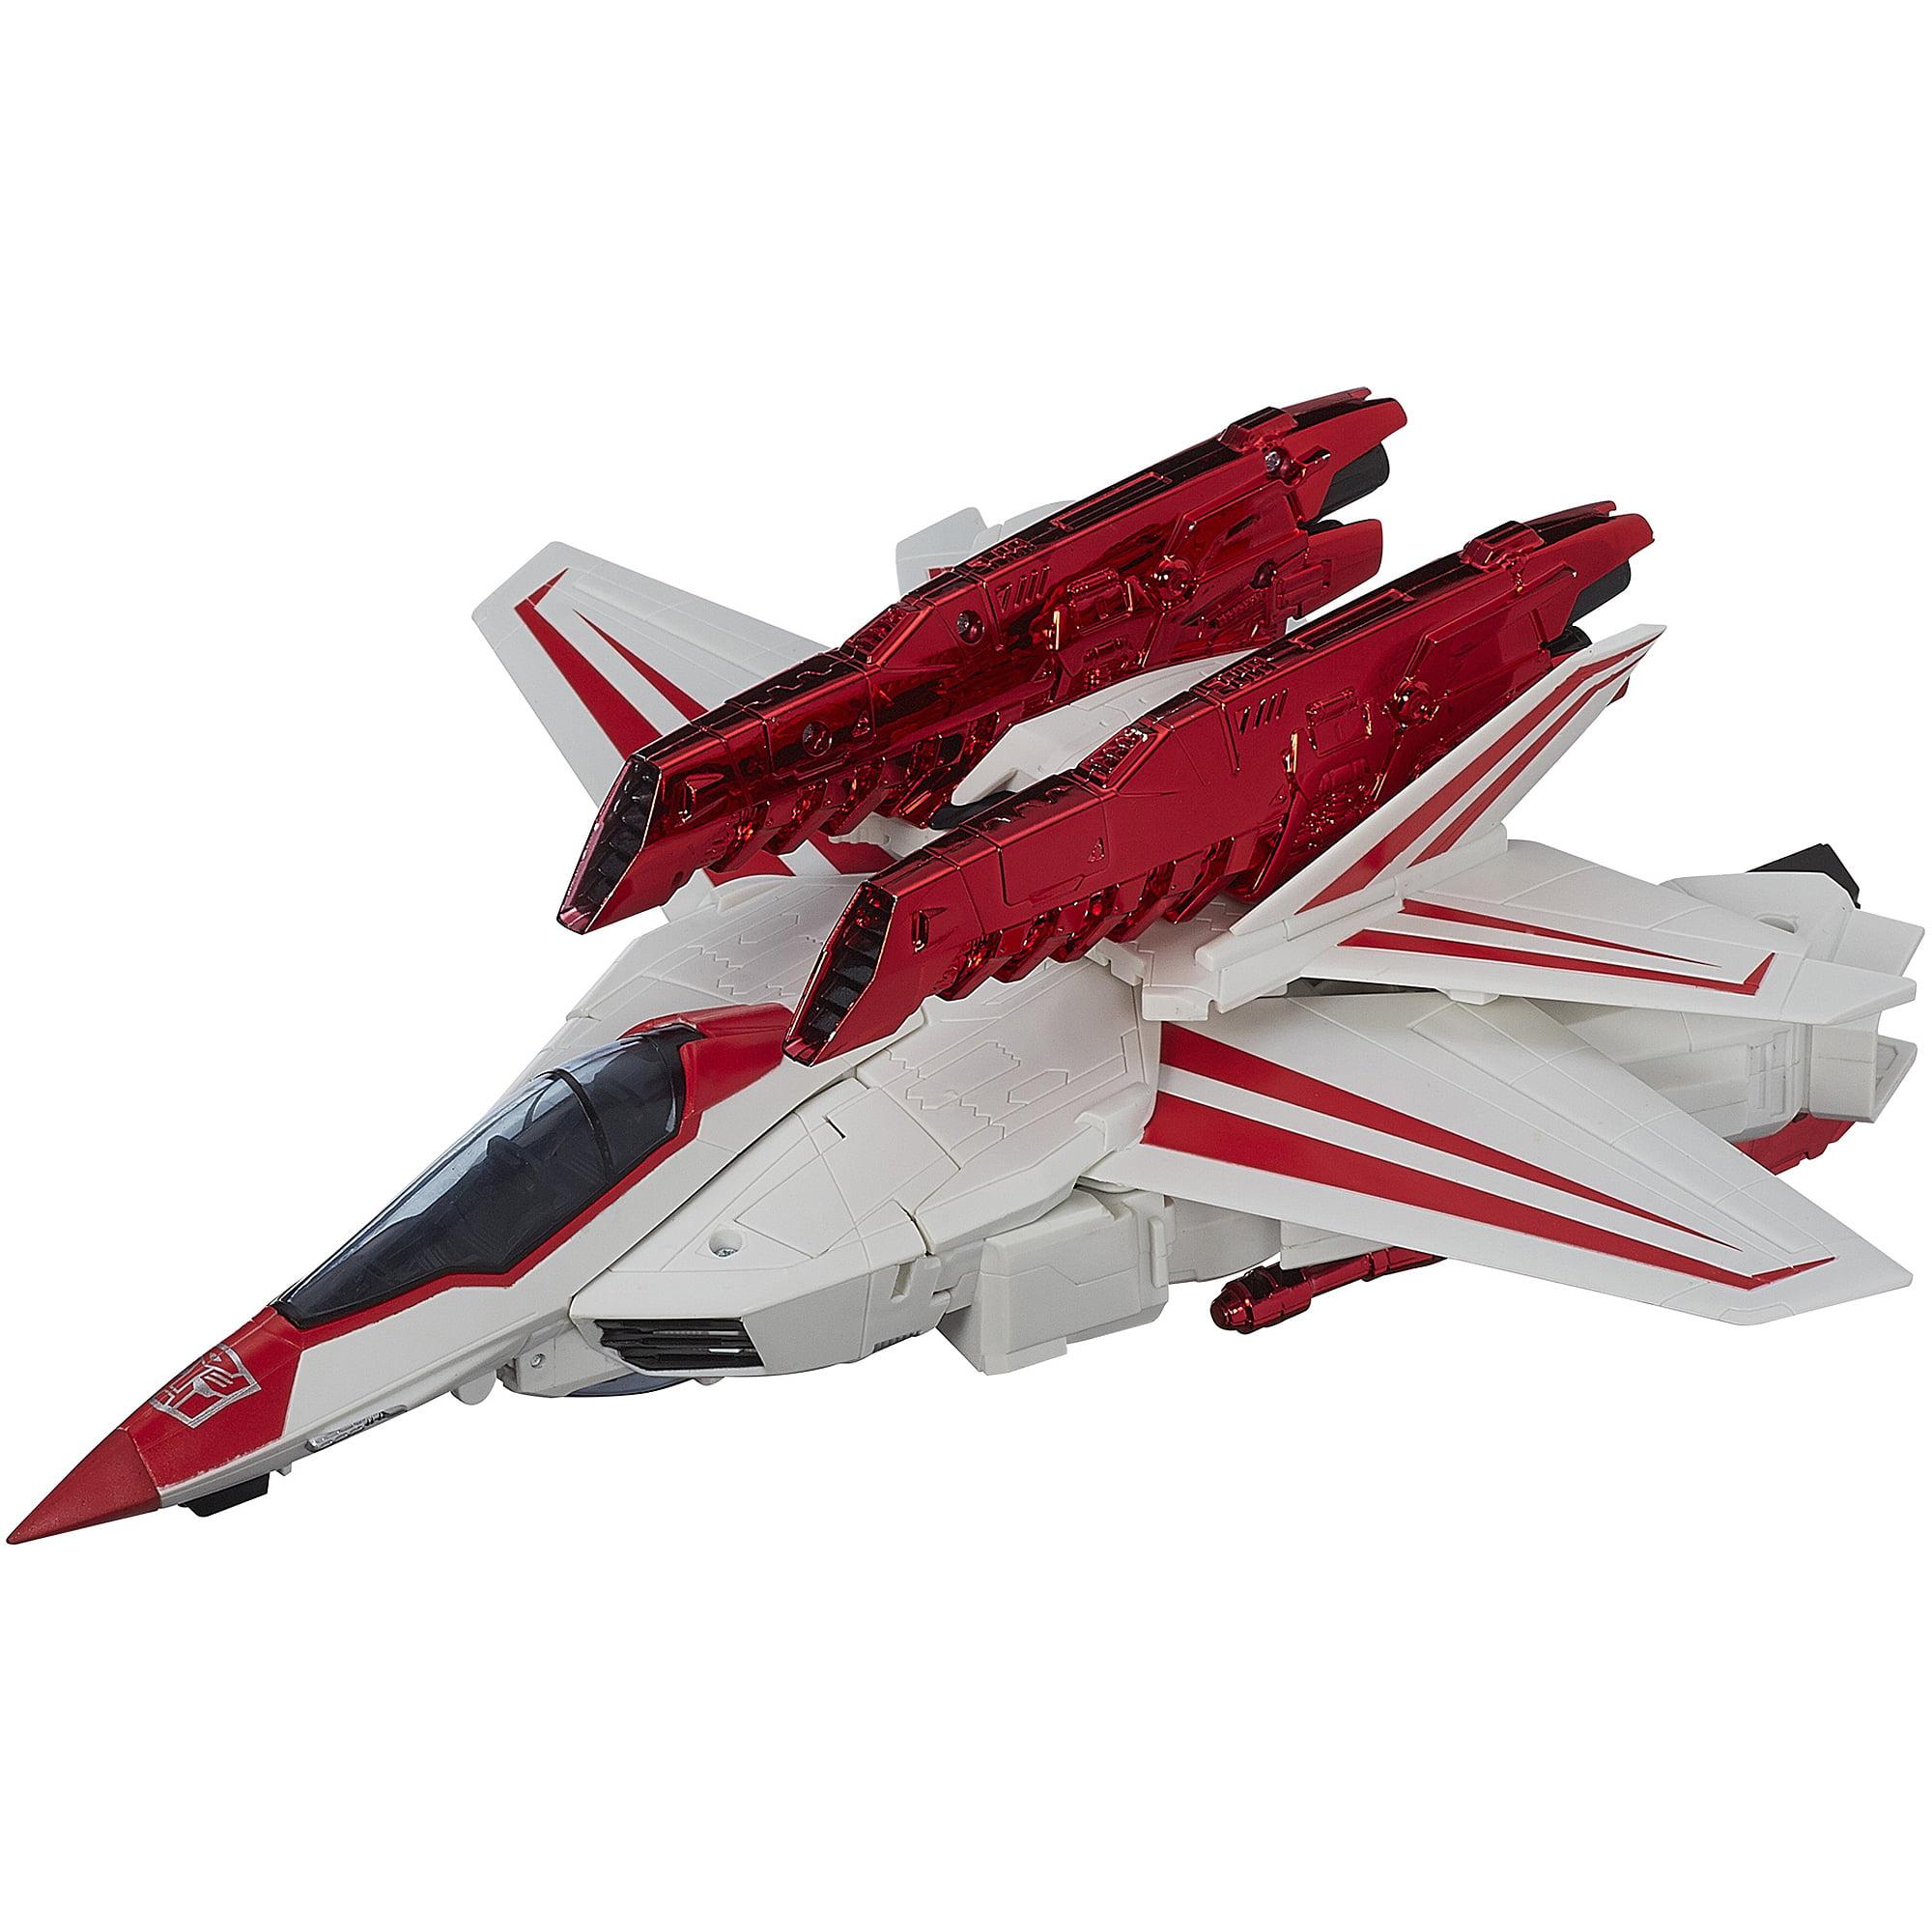 Transformers Generations Leader Class Jetfire Figure by Hasbro